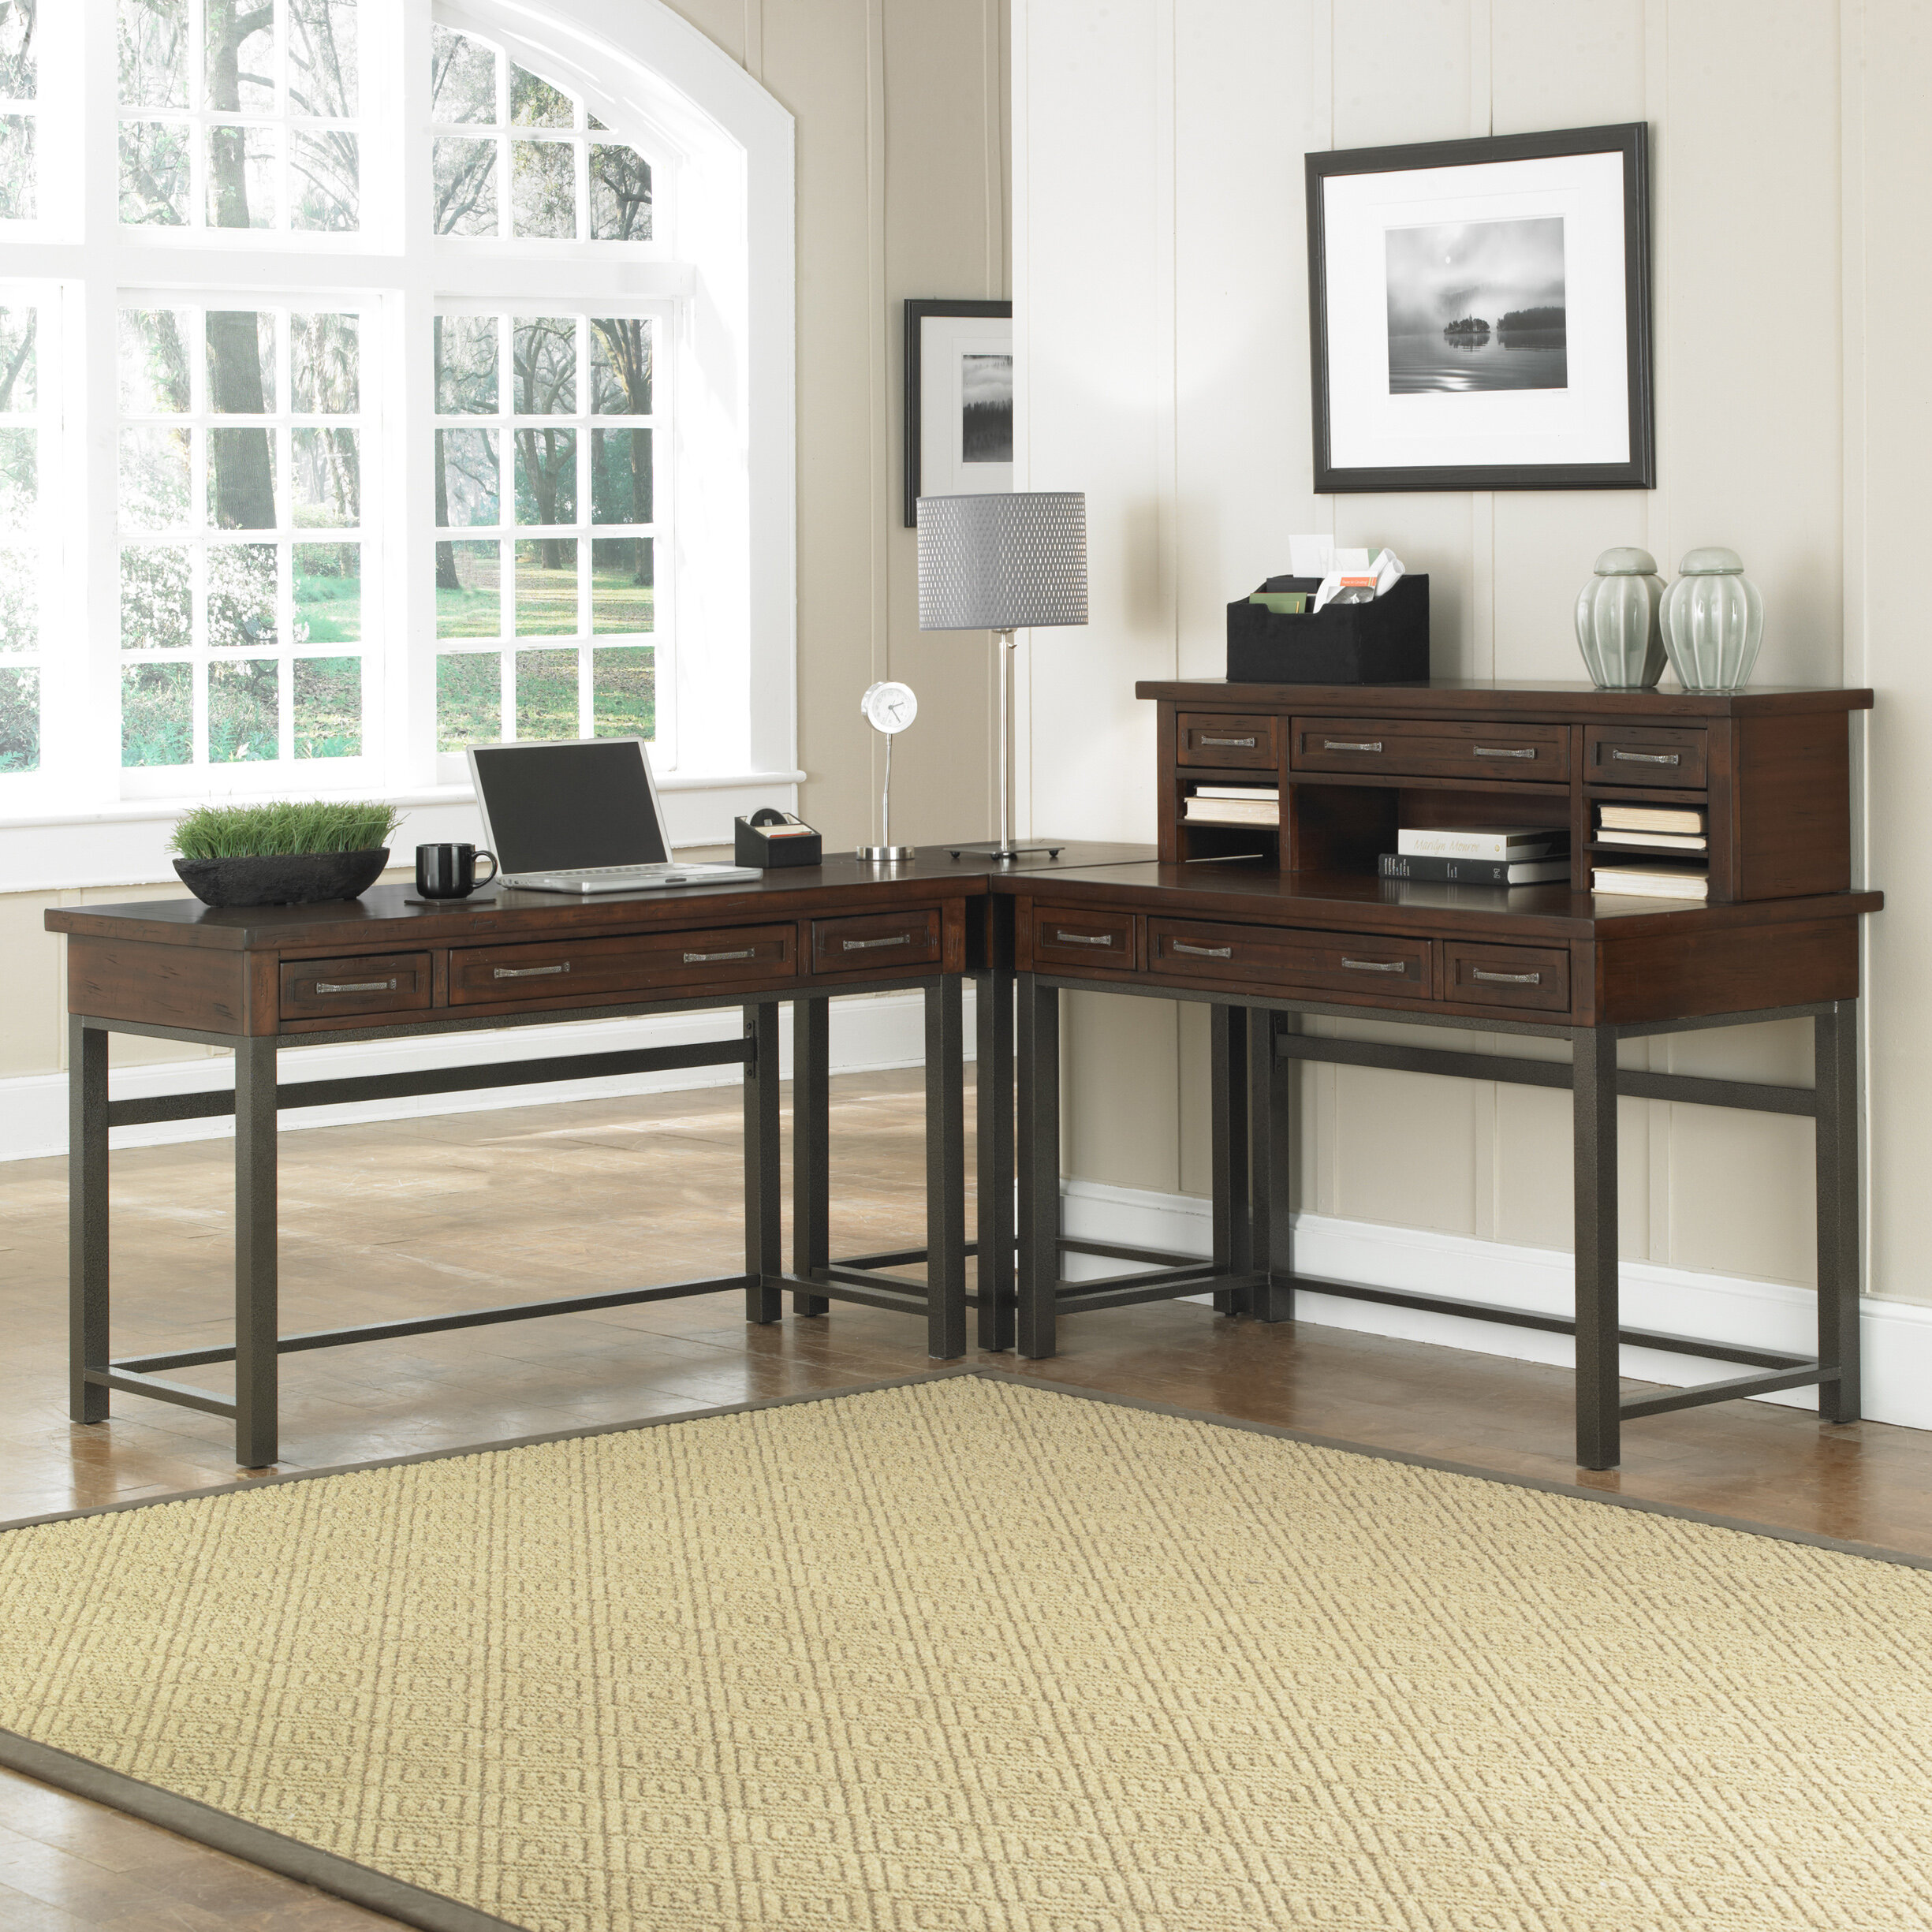 free lincoln home amp garden hutch shipping ward desk living simple den product corner today third ellen porch